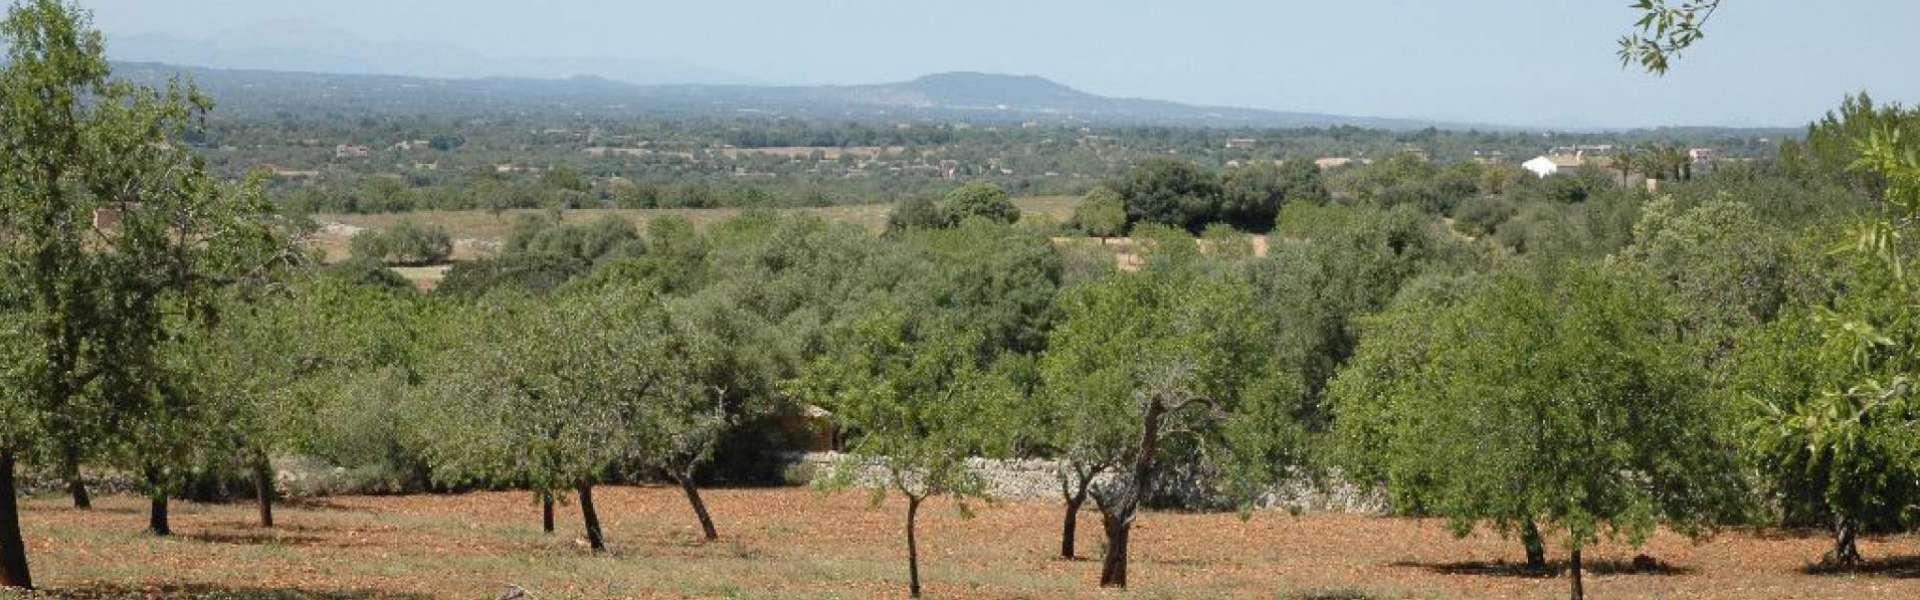 Realisiertes Projekt mit traumhaftem Panorama-Weitblick in Santanyi